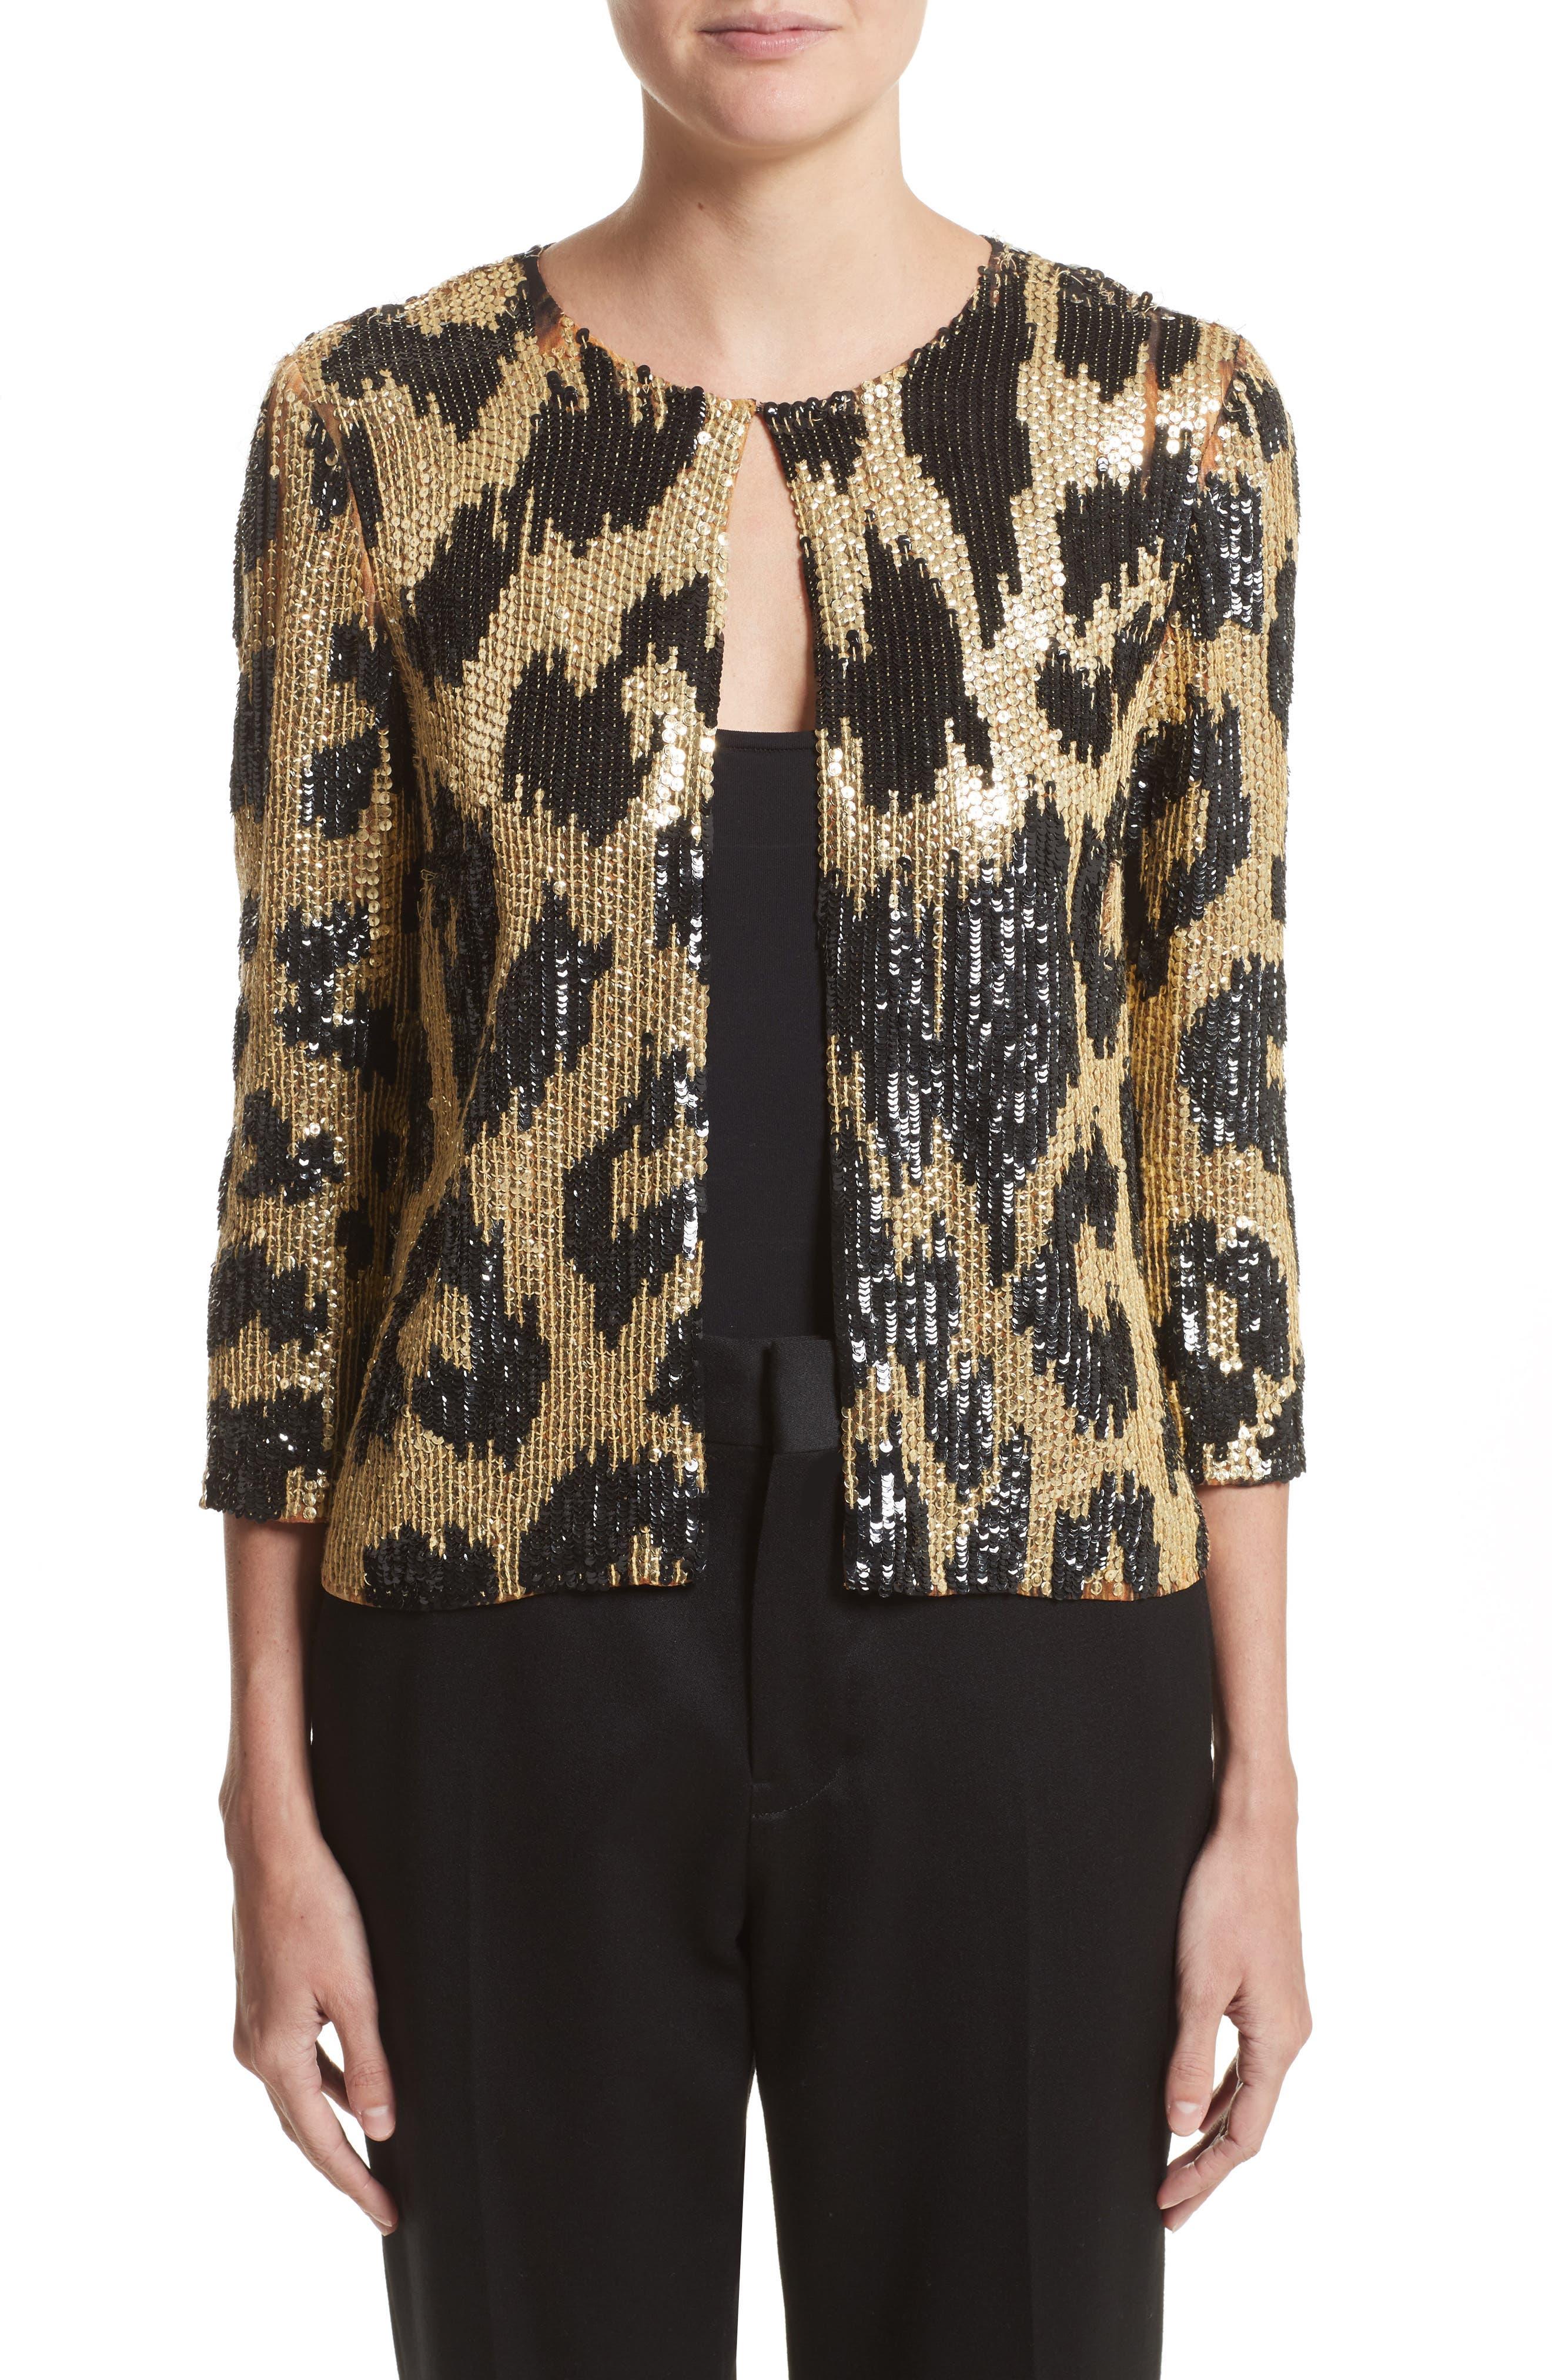 Alternate Image 1 Selected - Naeem Khan Cheetah Print Sequin Jacket